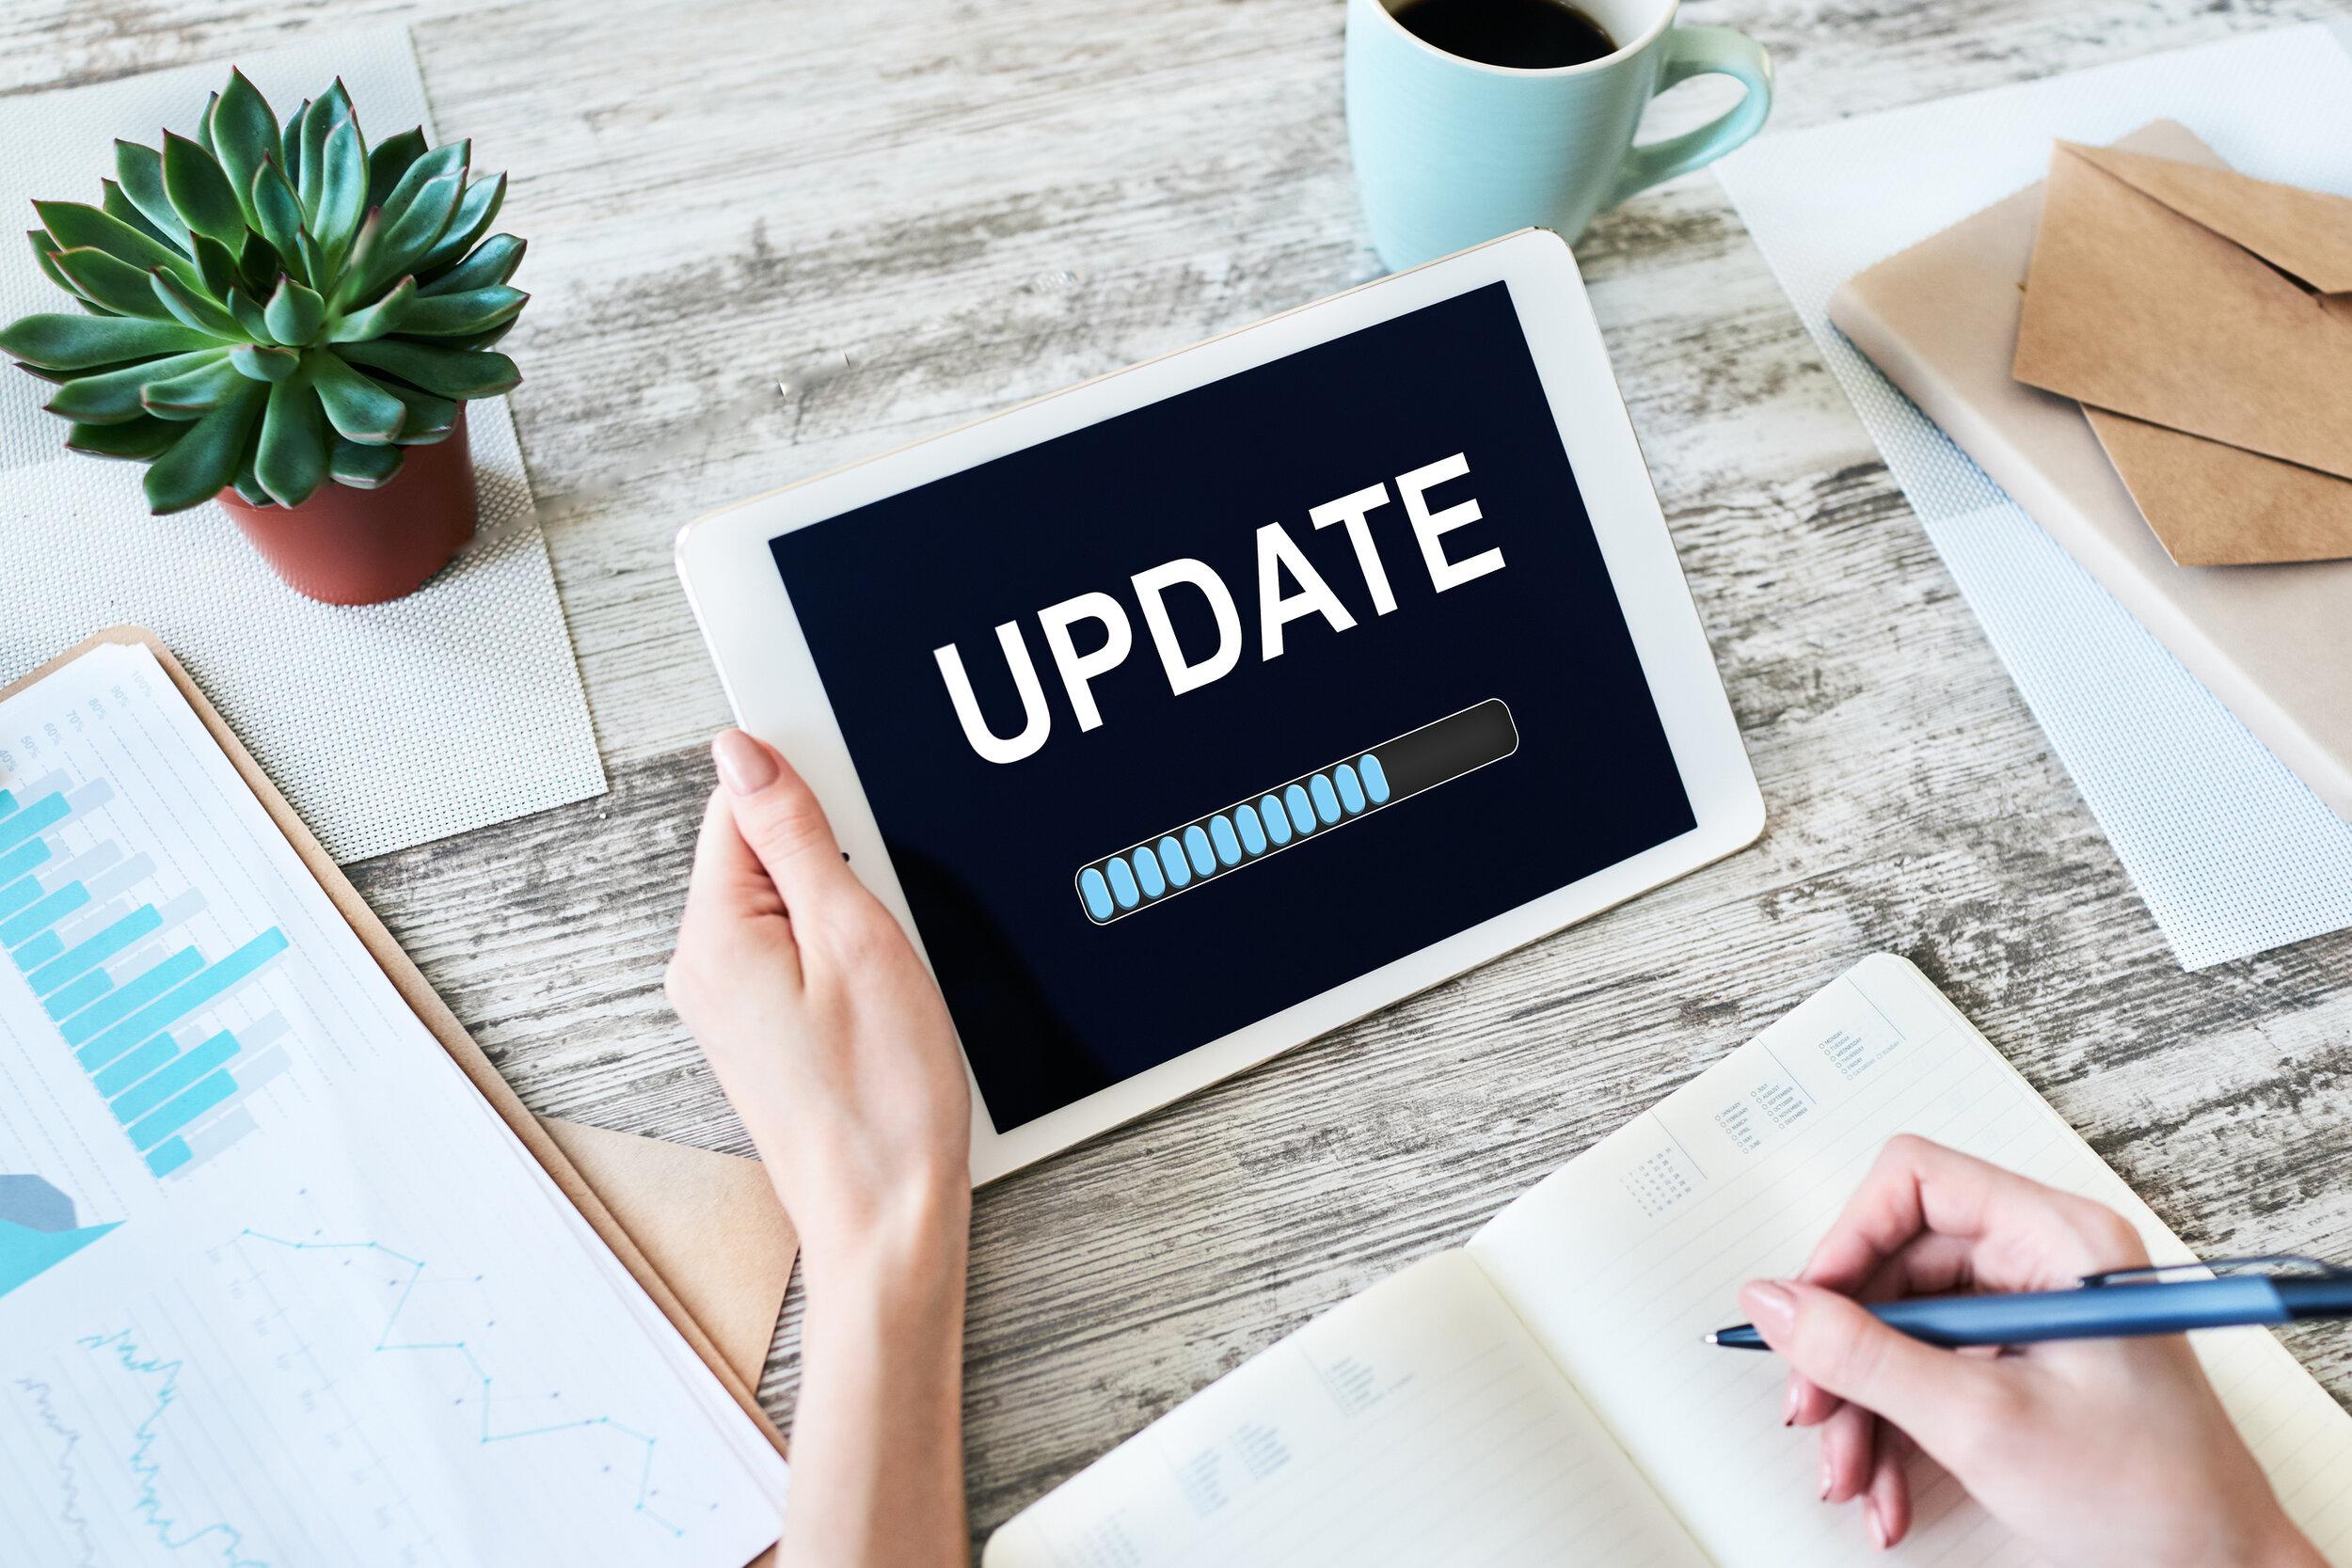 bigstock-Update-Status-Bar-On-Device-Sc-270562252.jpg